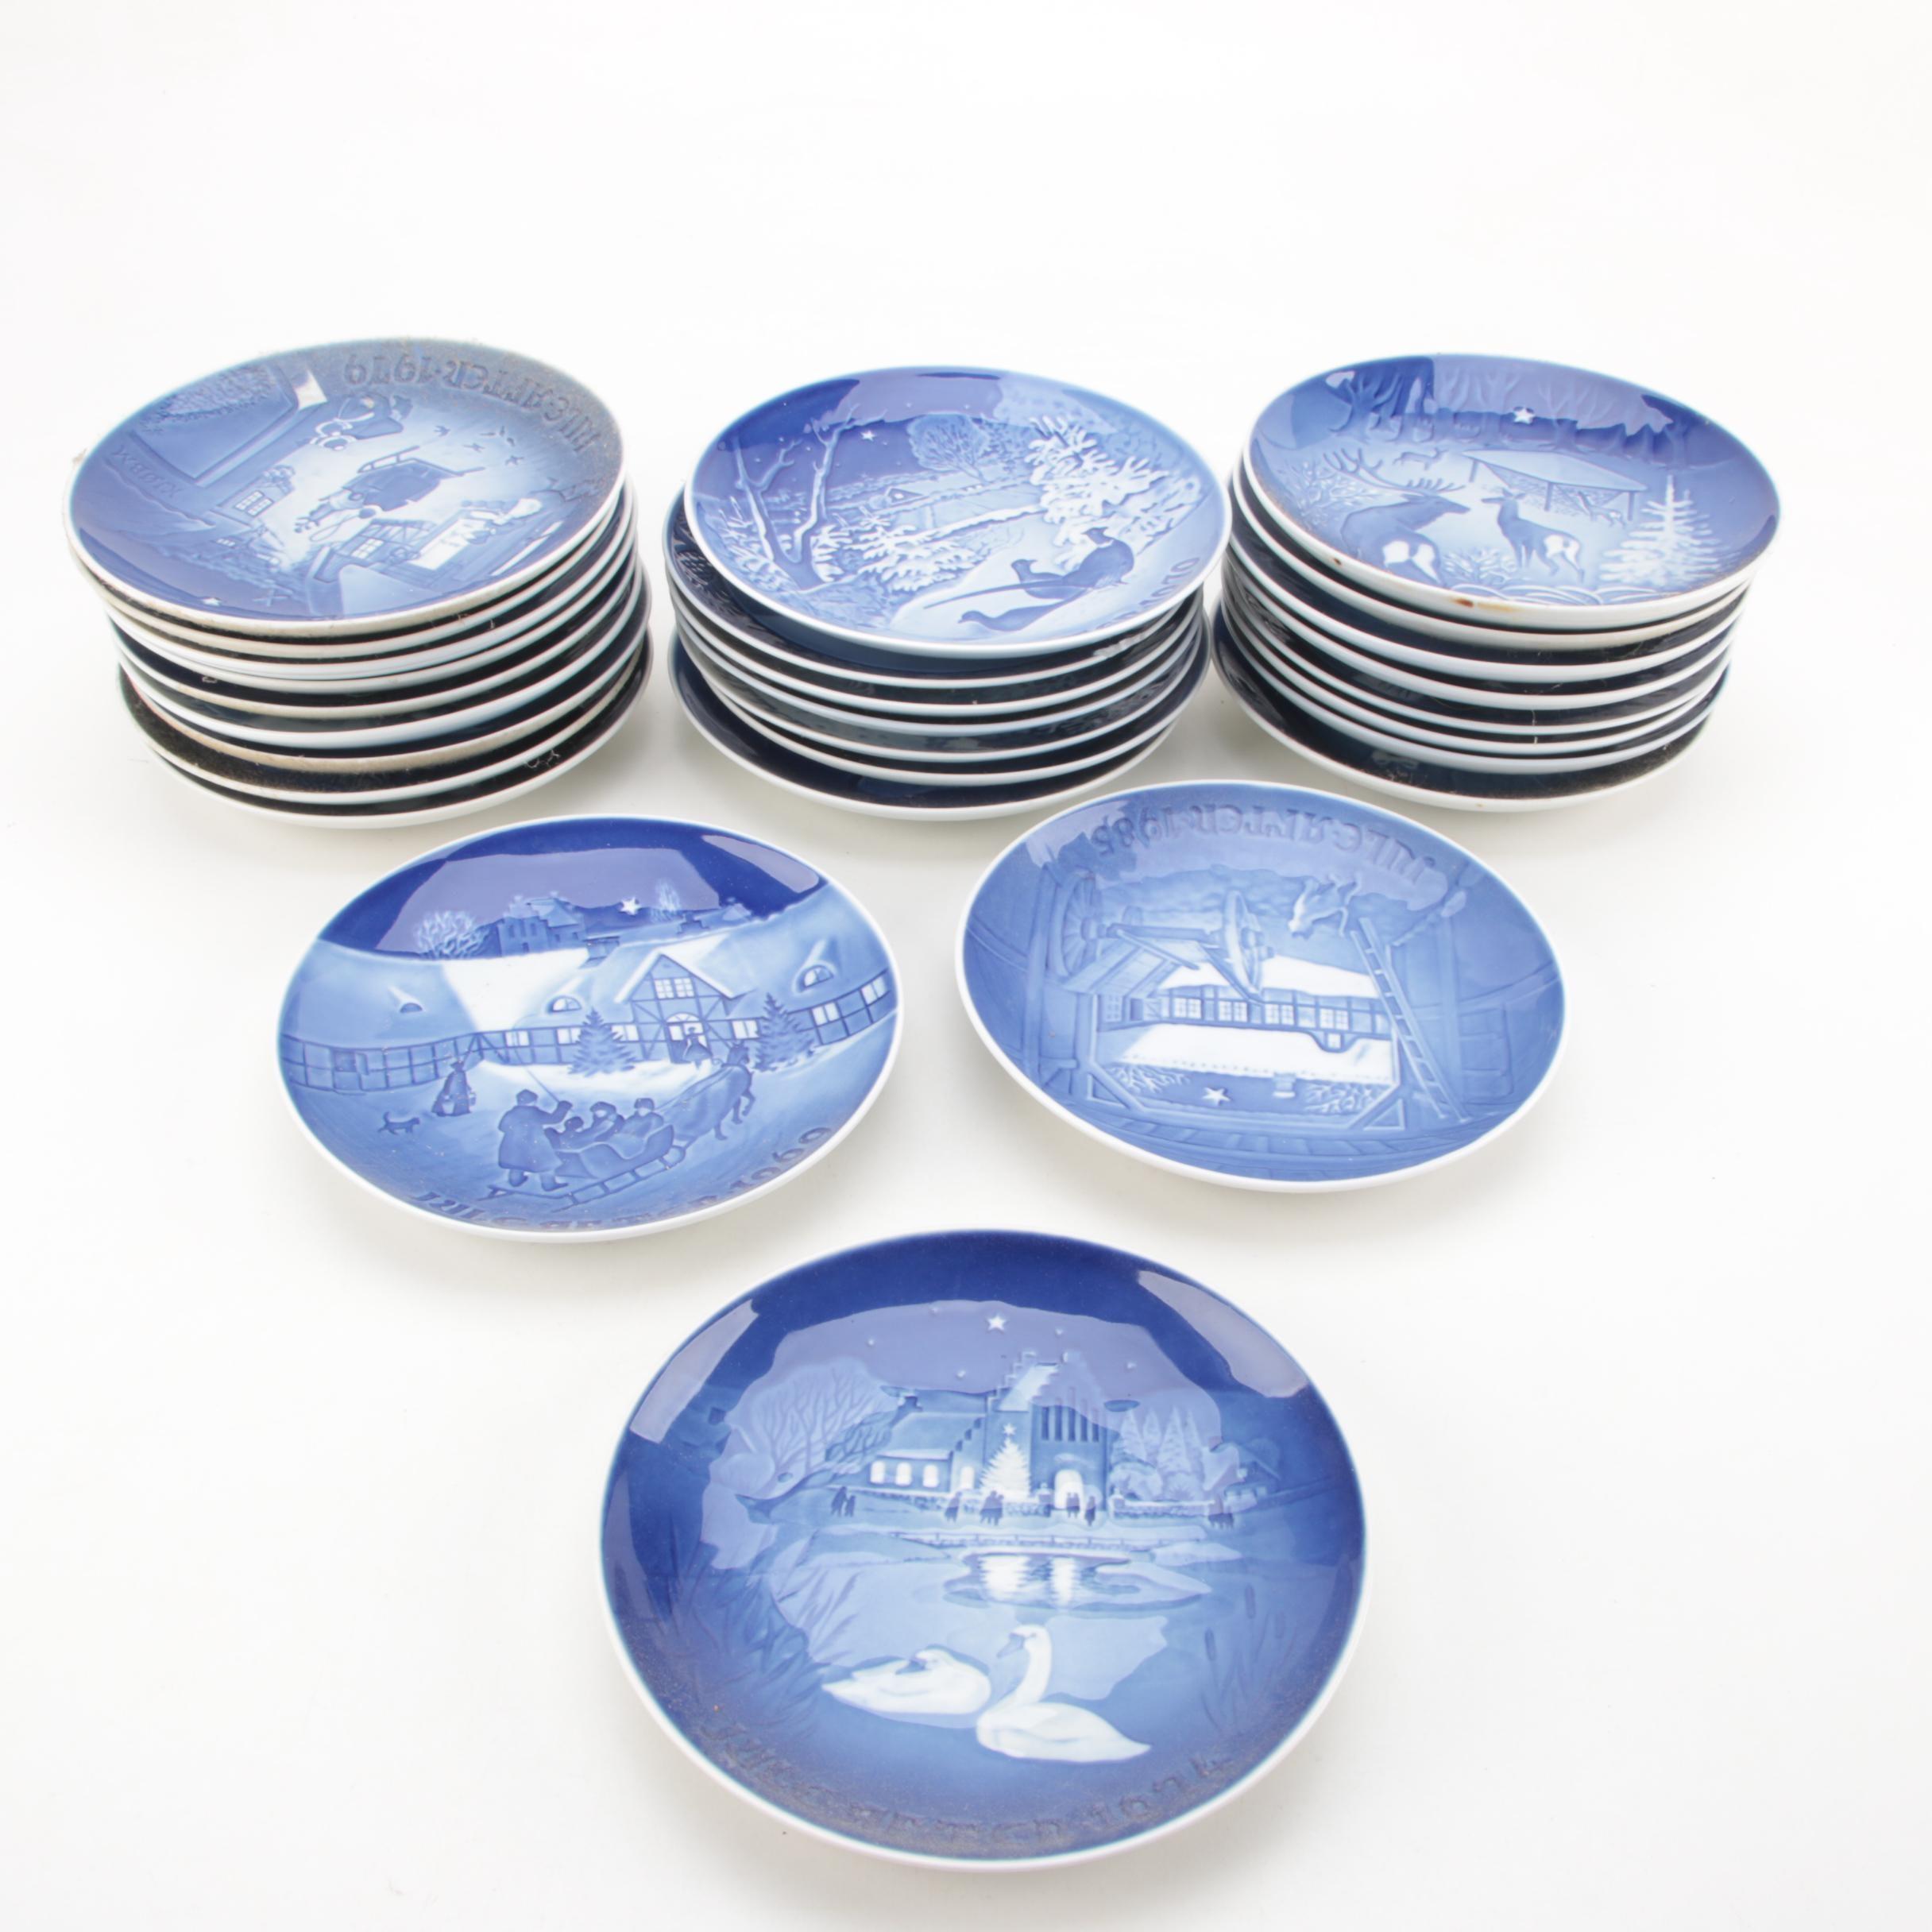 Bing & Grøndahl Commemorative Christmas Collector Plates